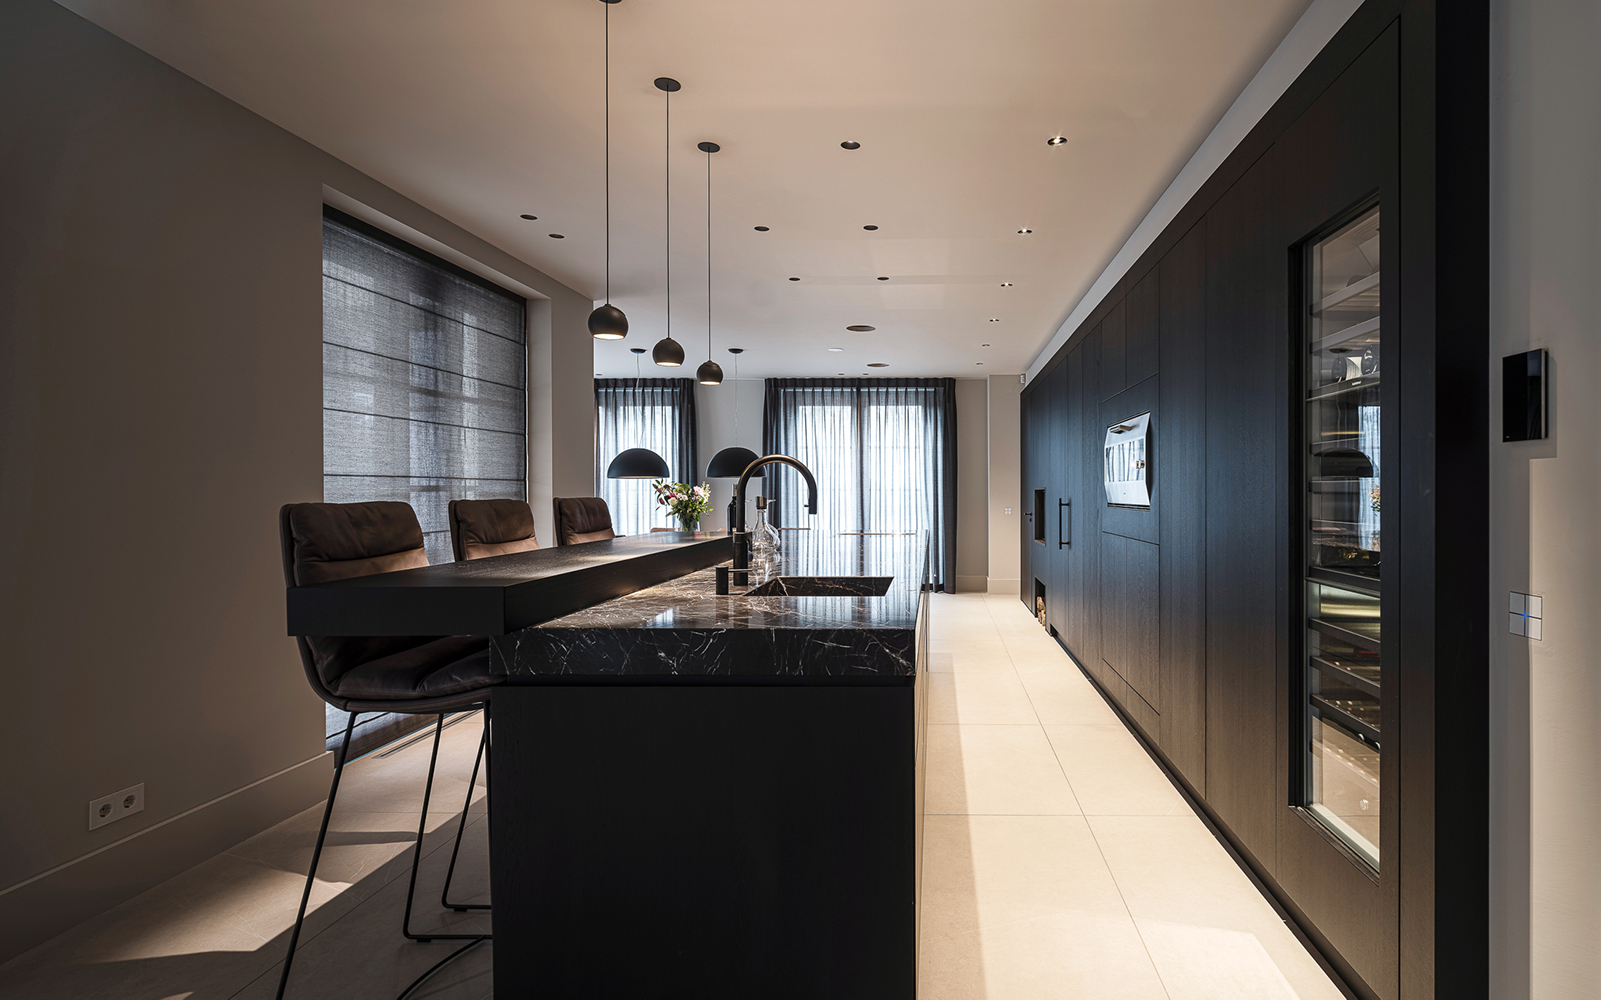 marmer keukenblad, Van Essen Keukens, donkere keuken, modern